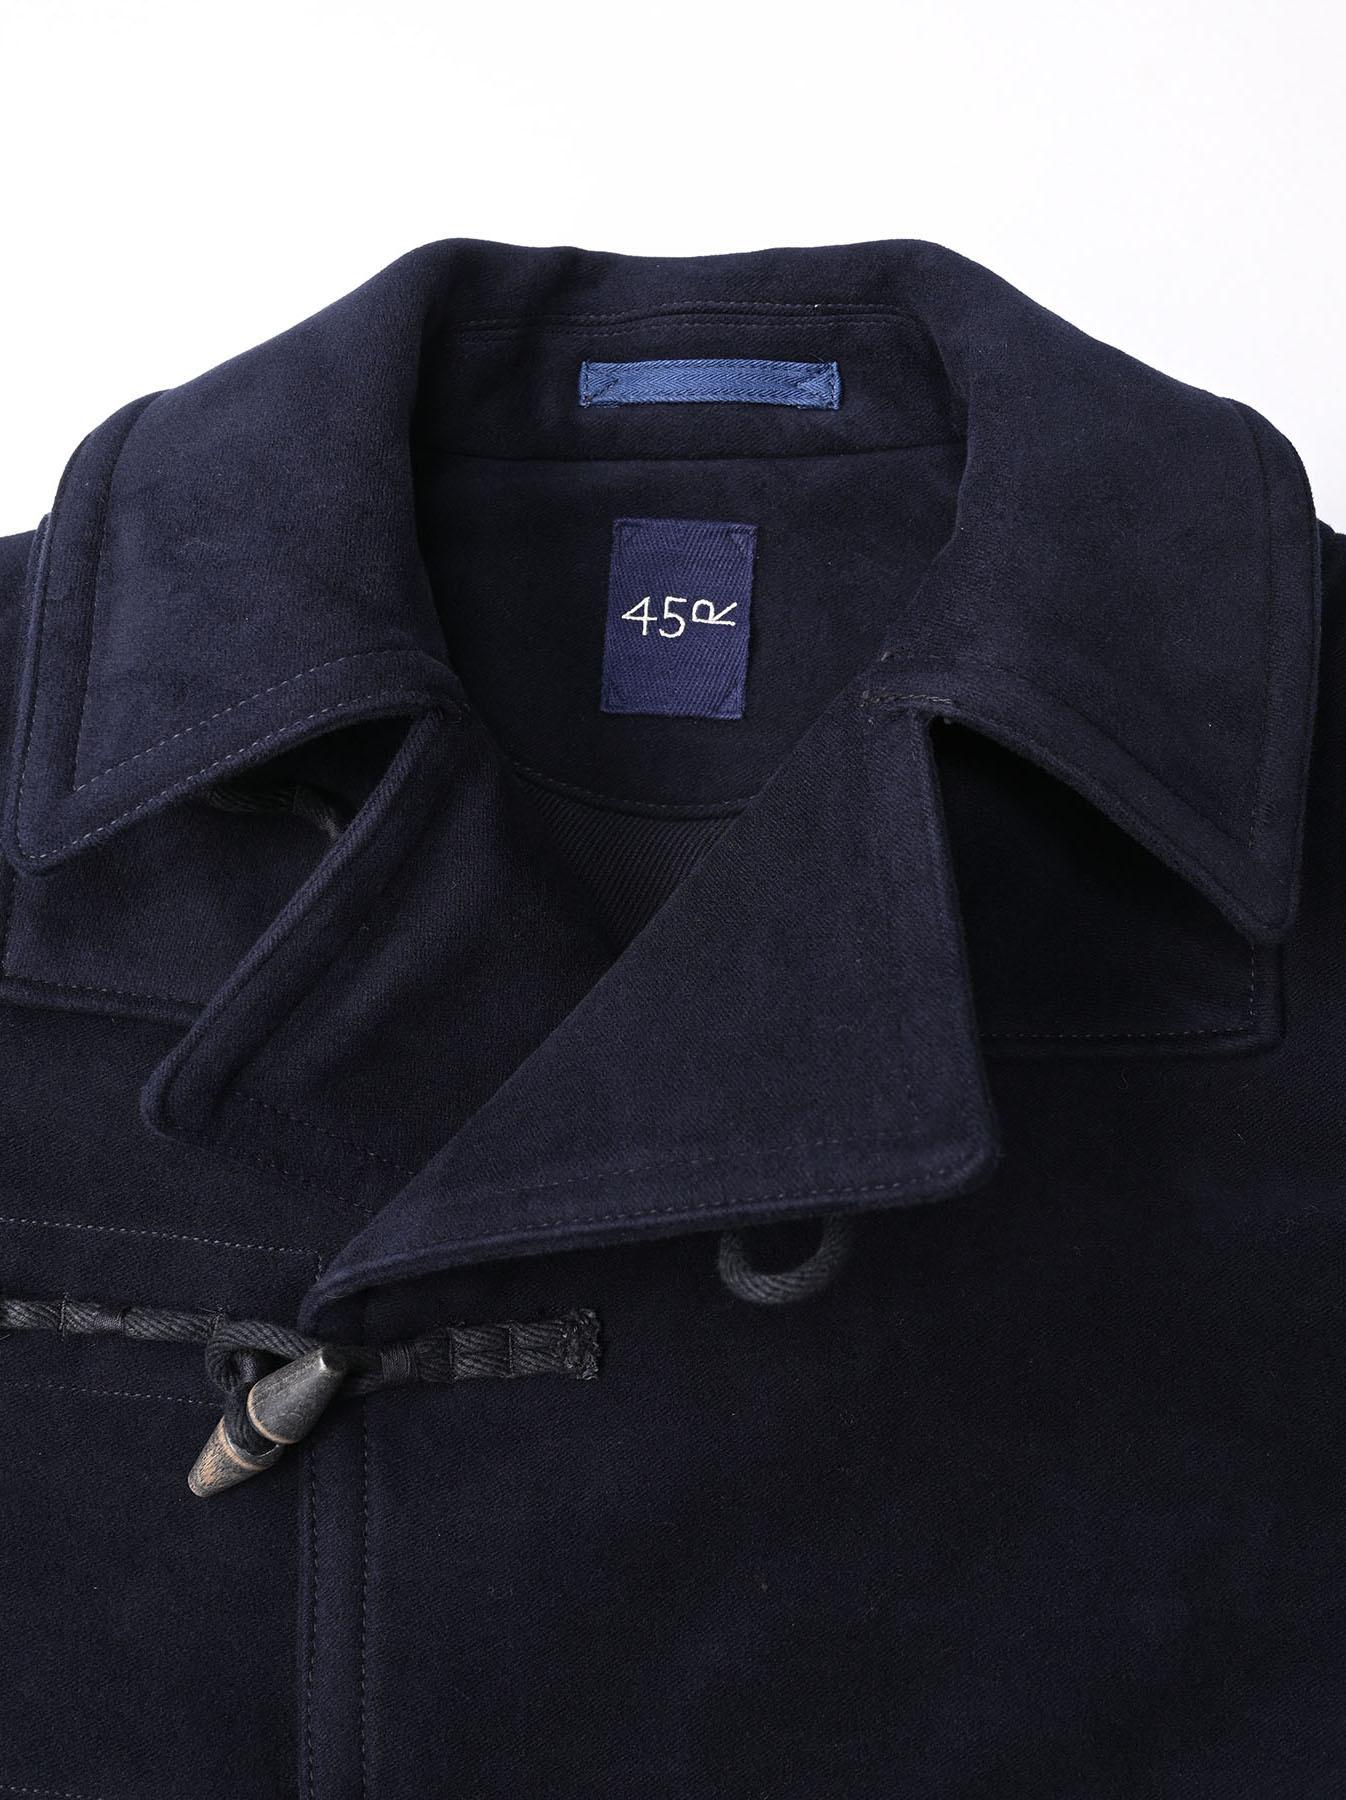 Thick Cotton Flannel Akiya Jacket-4